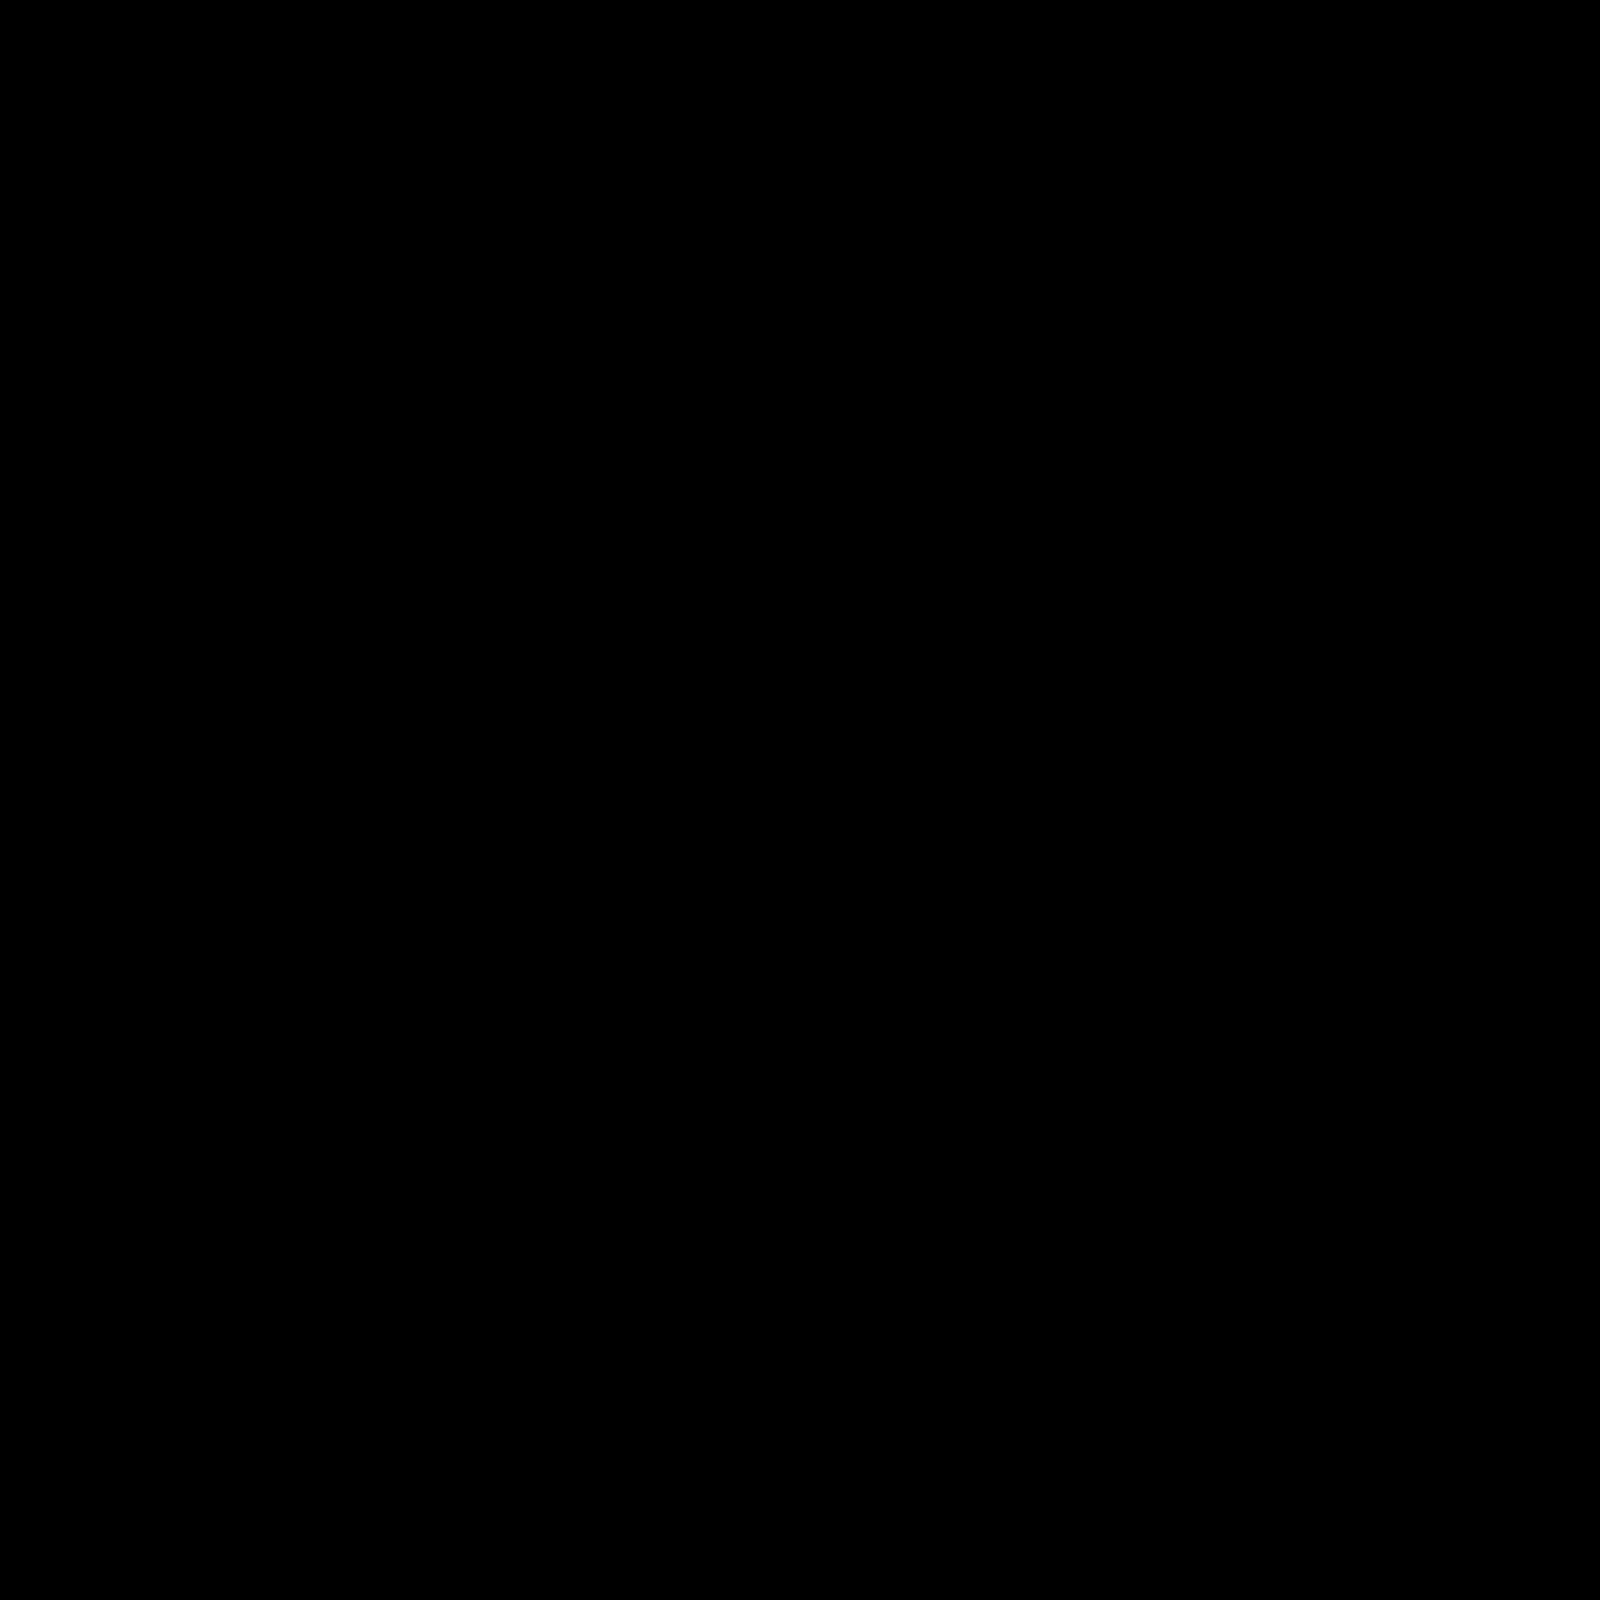 Ciśnienie icon